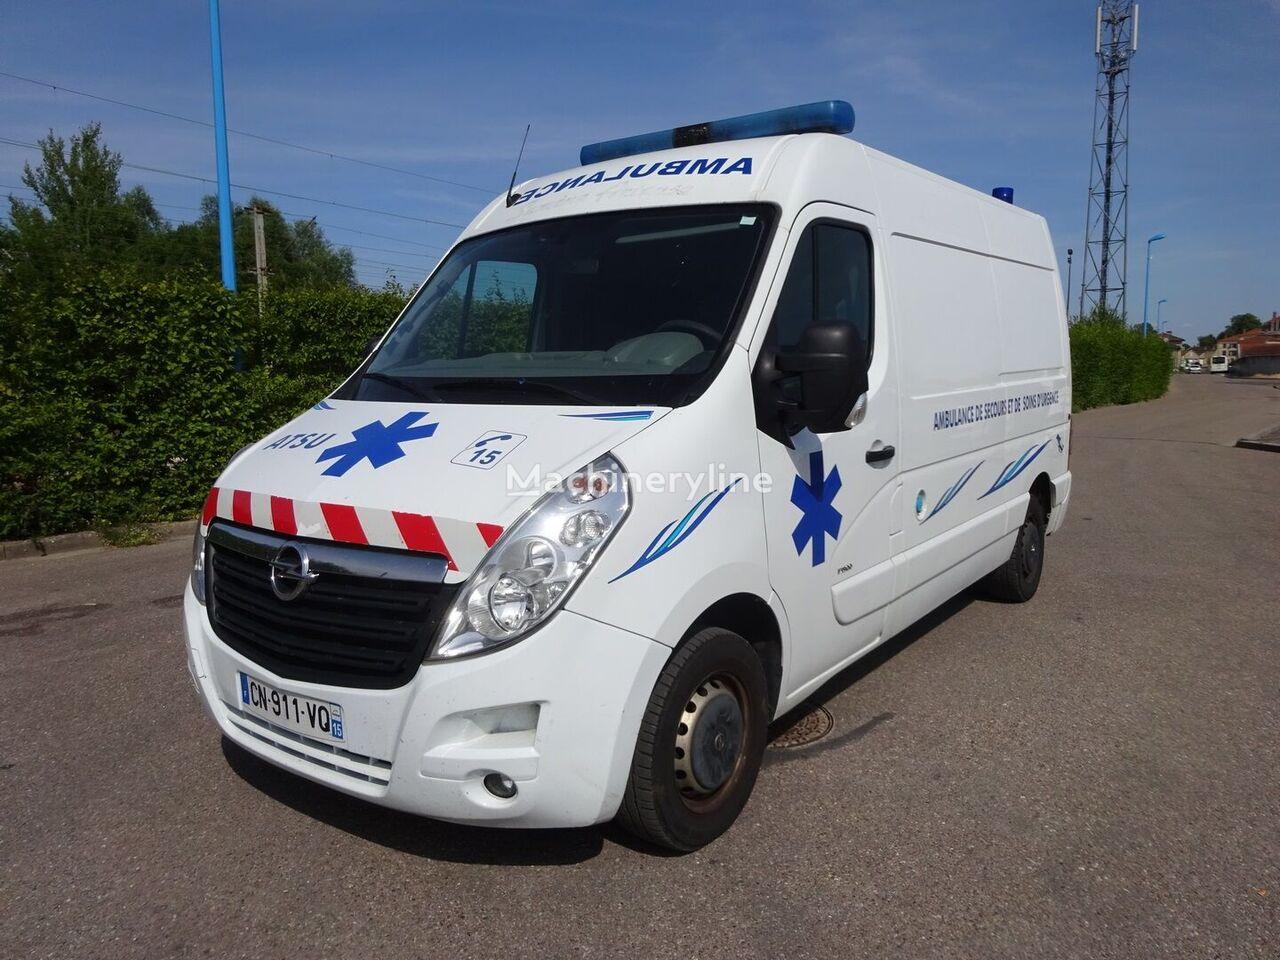 OPEL MOVANO L2H2 2012 ambulancia